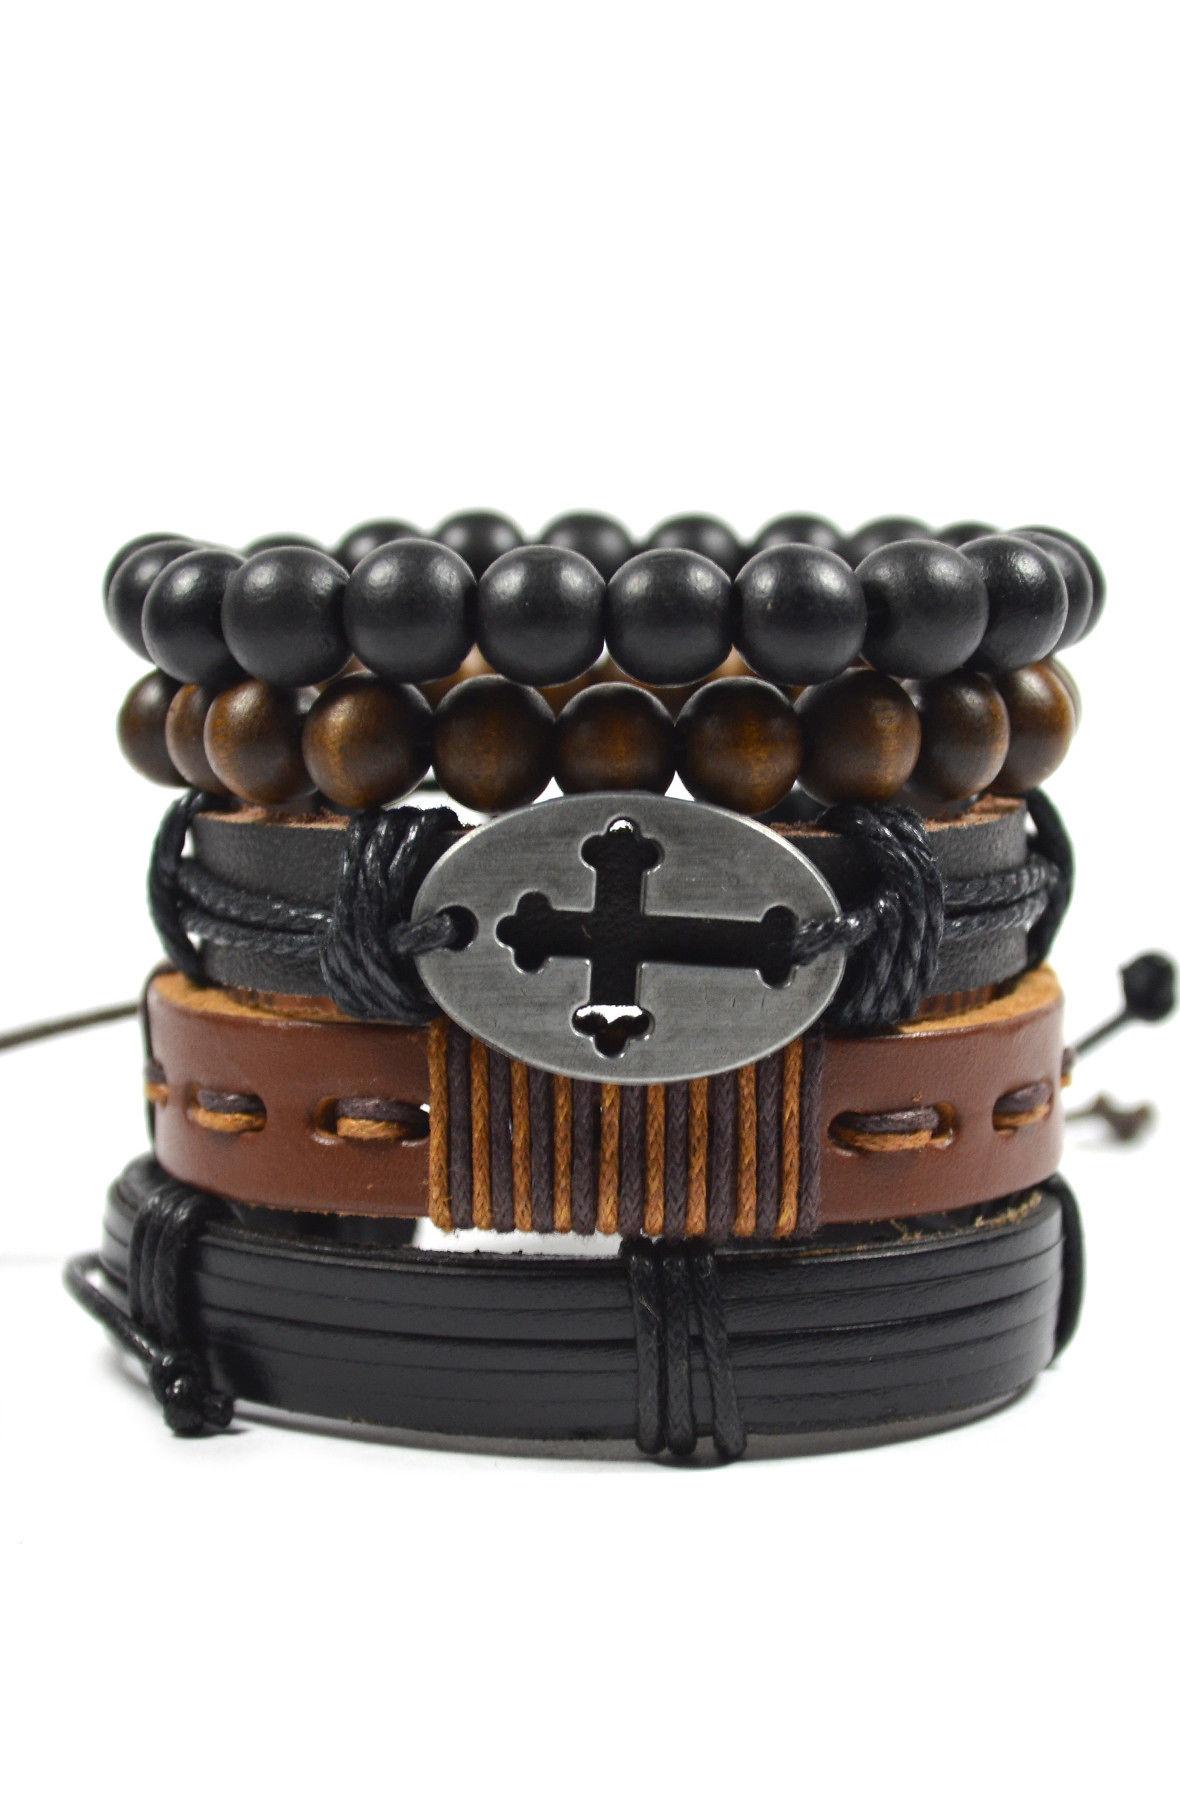 5 Pack Black and Brown Cross Men's Bracelet Set